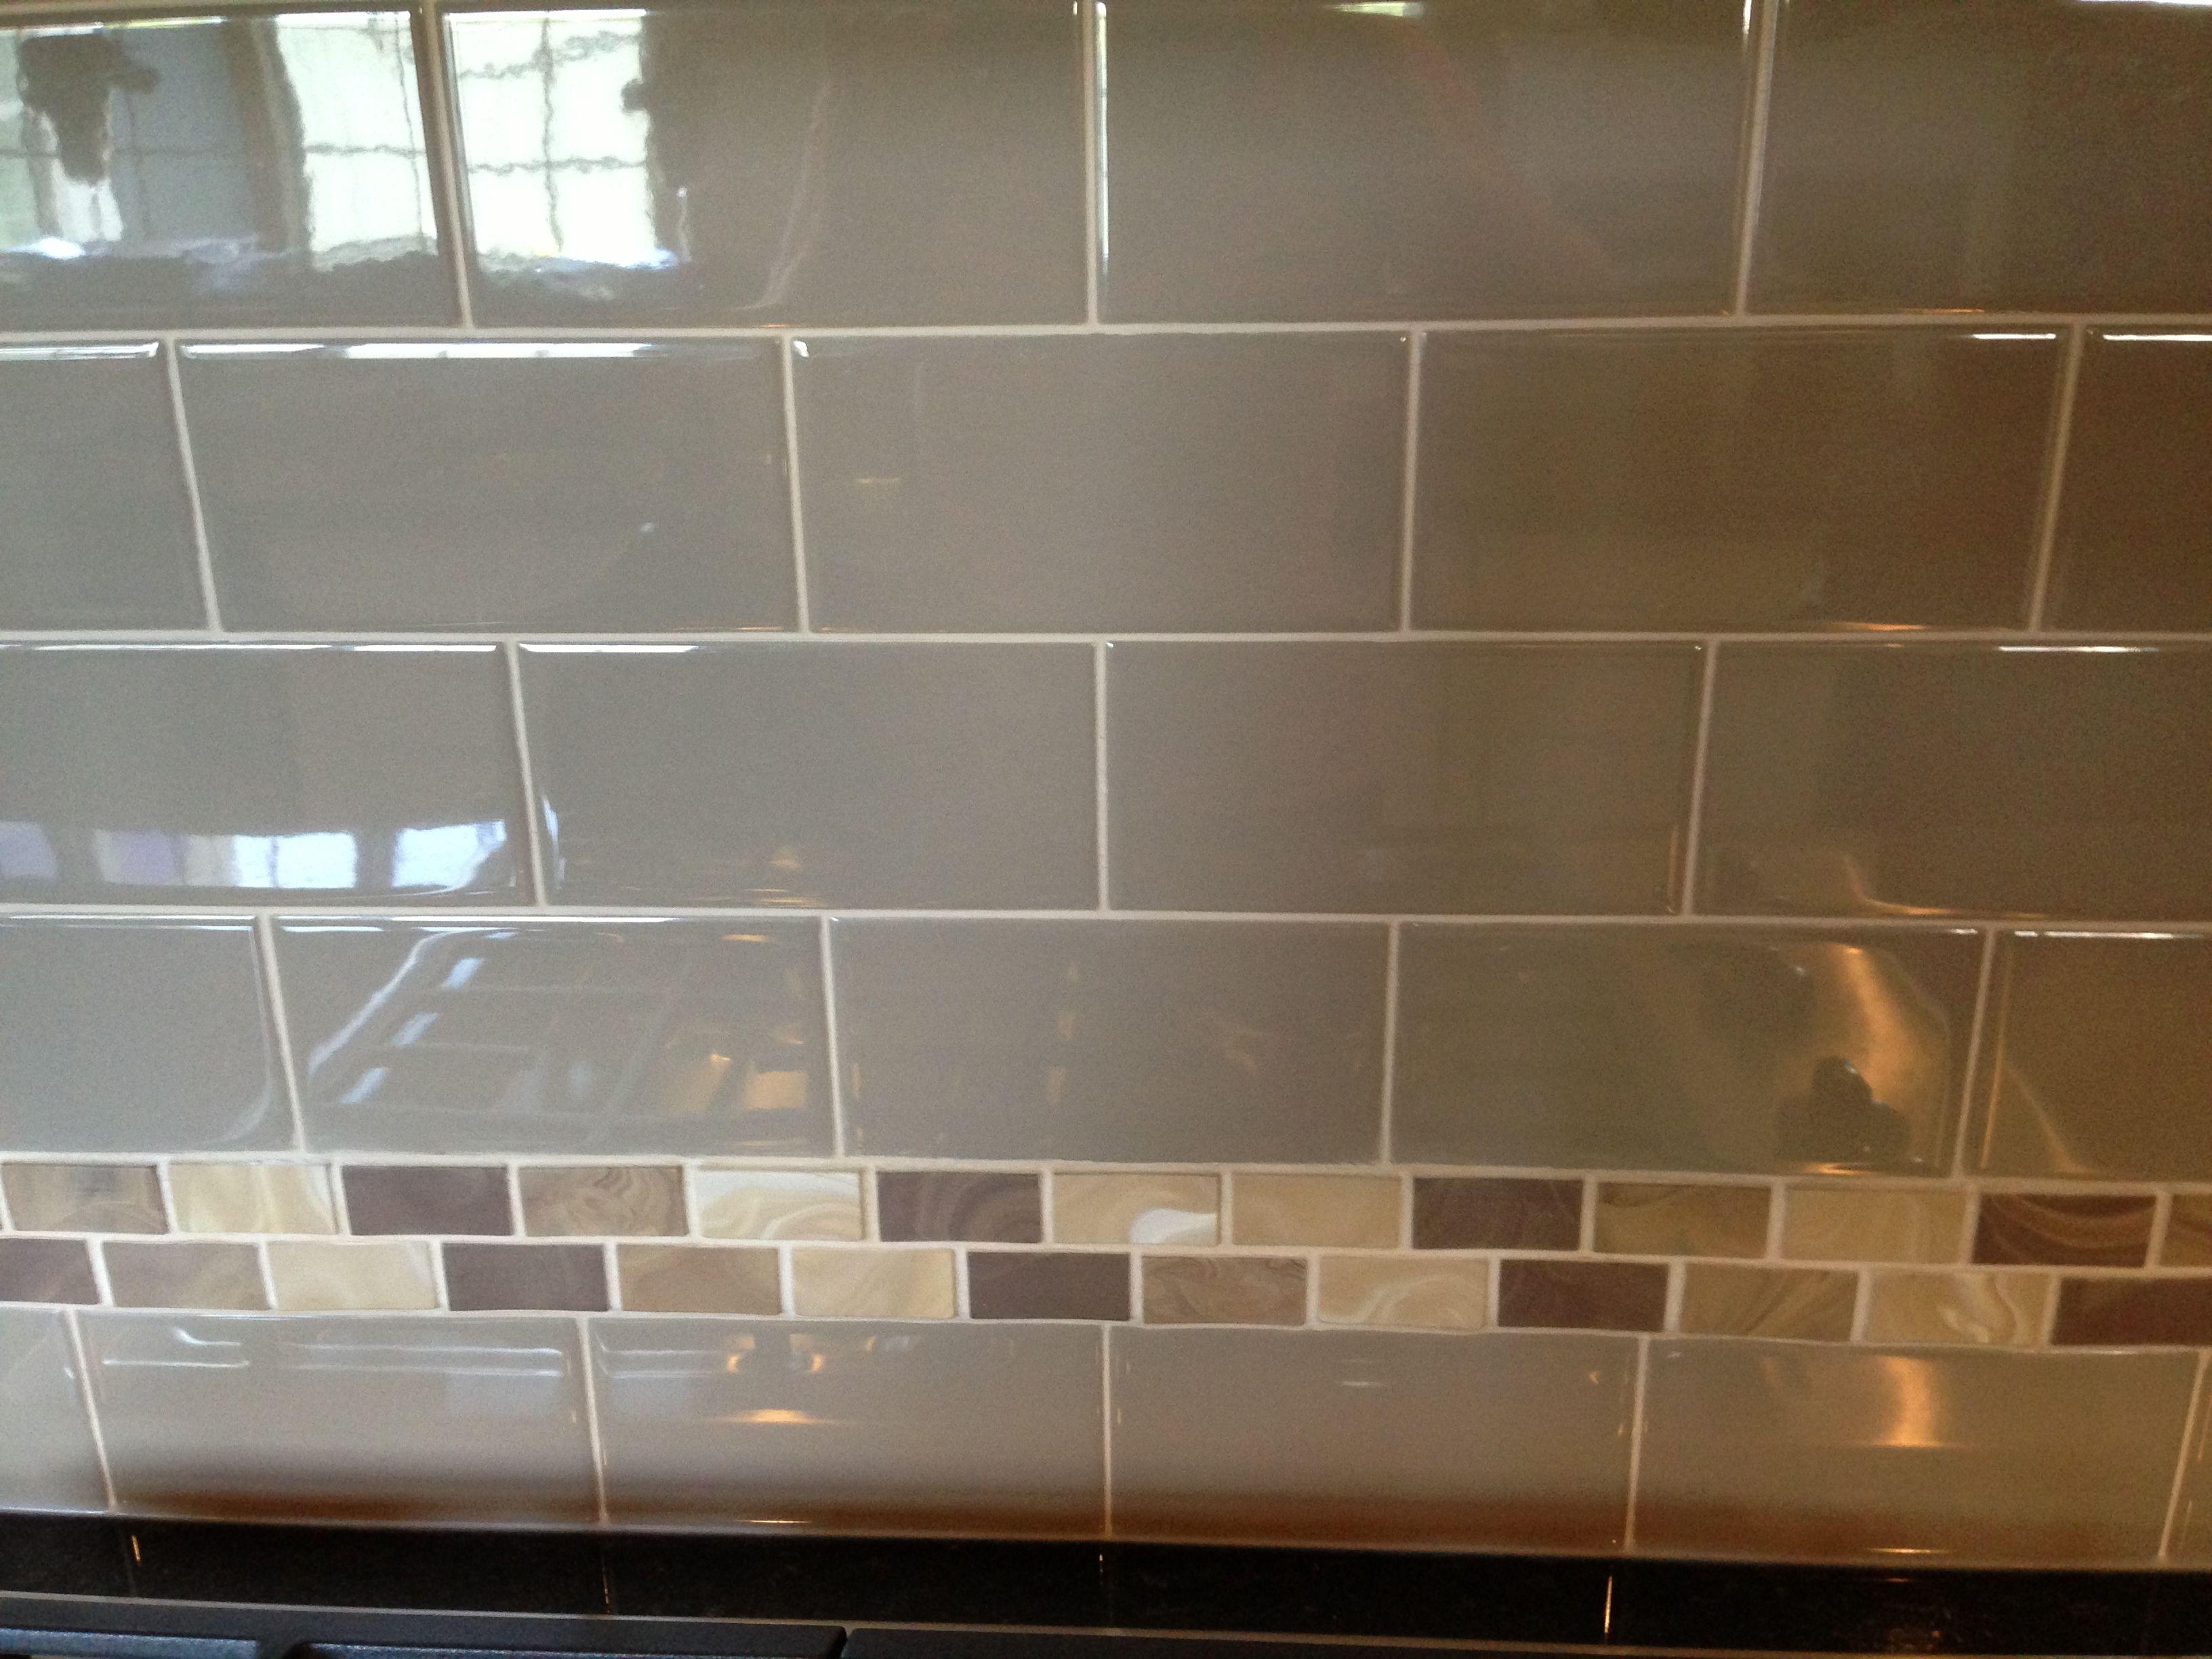 kitchen backsplash minus the accent strip backsplash pinterest kitchen backsplash subway tile with border